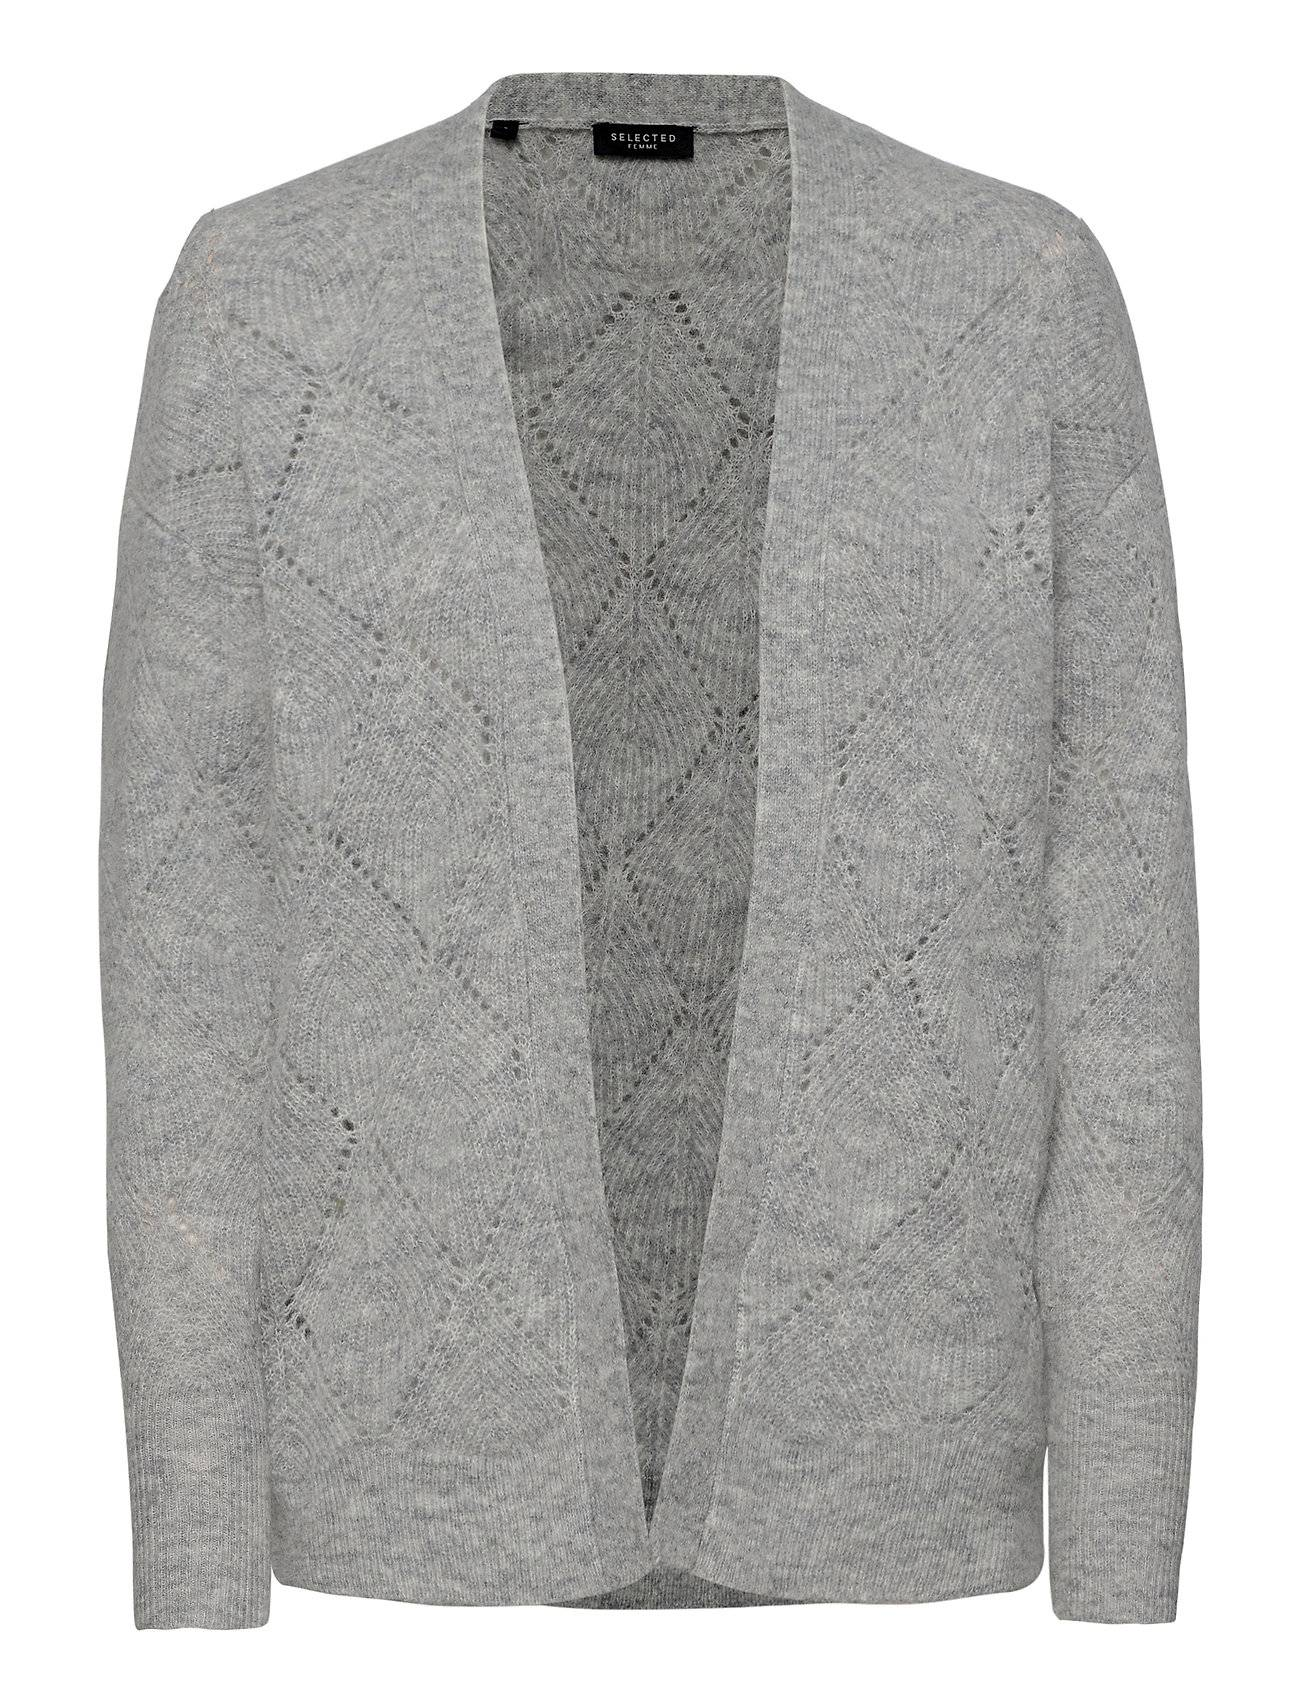 Selected Femme Slfsif Ls Structure Knit Cardigan B Neuletakki Harmaa Selected Femme